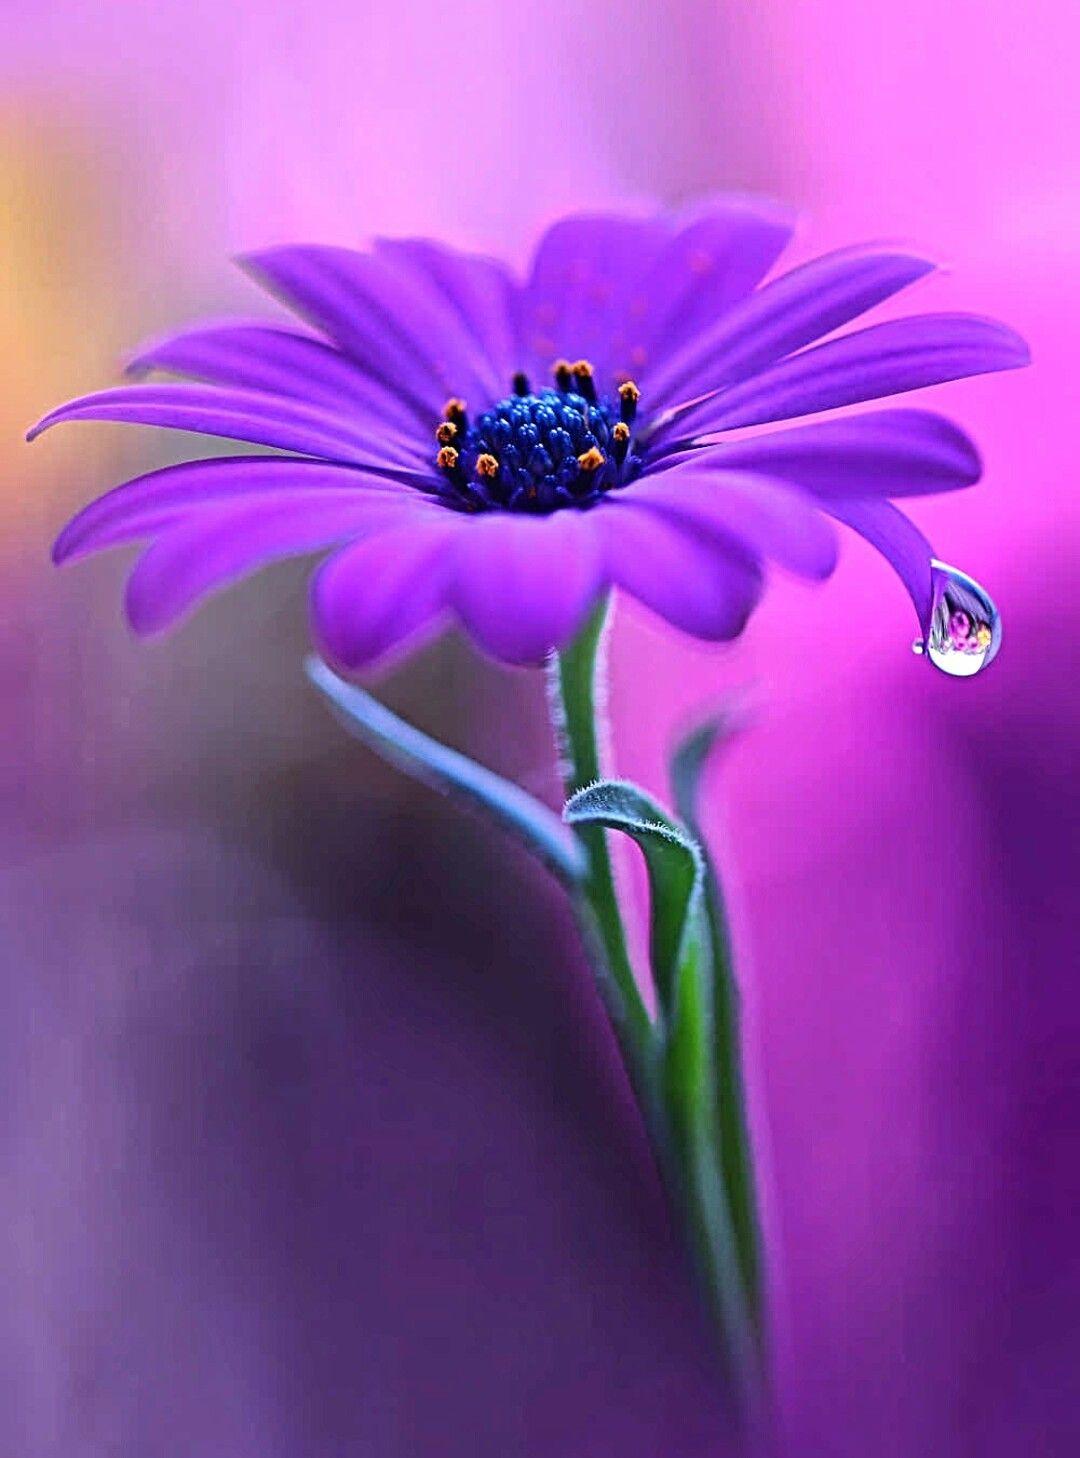 Pin De Mustafa Emin Turker En Flores Flores Bonitas Rosas Purpuras Rosas Bonitas